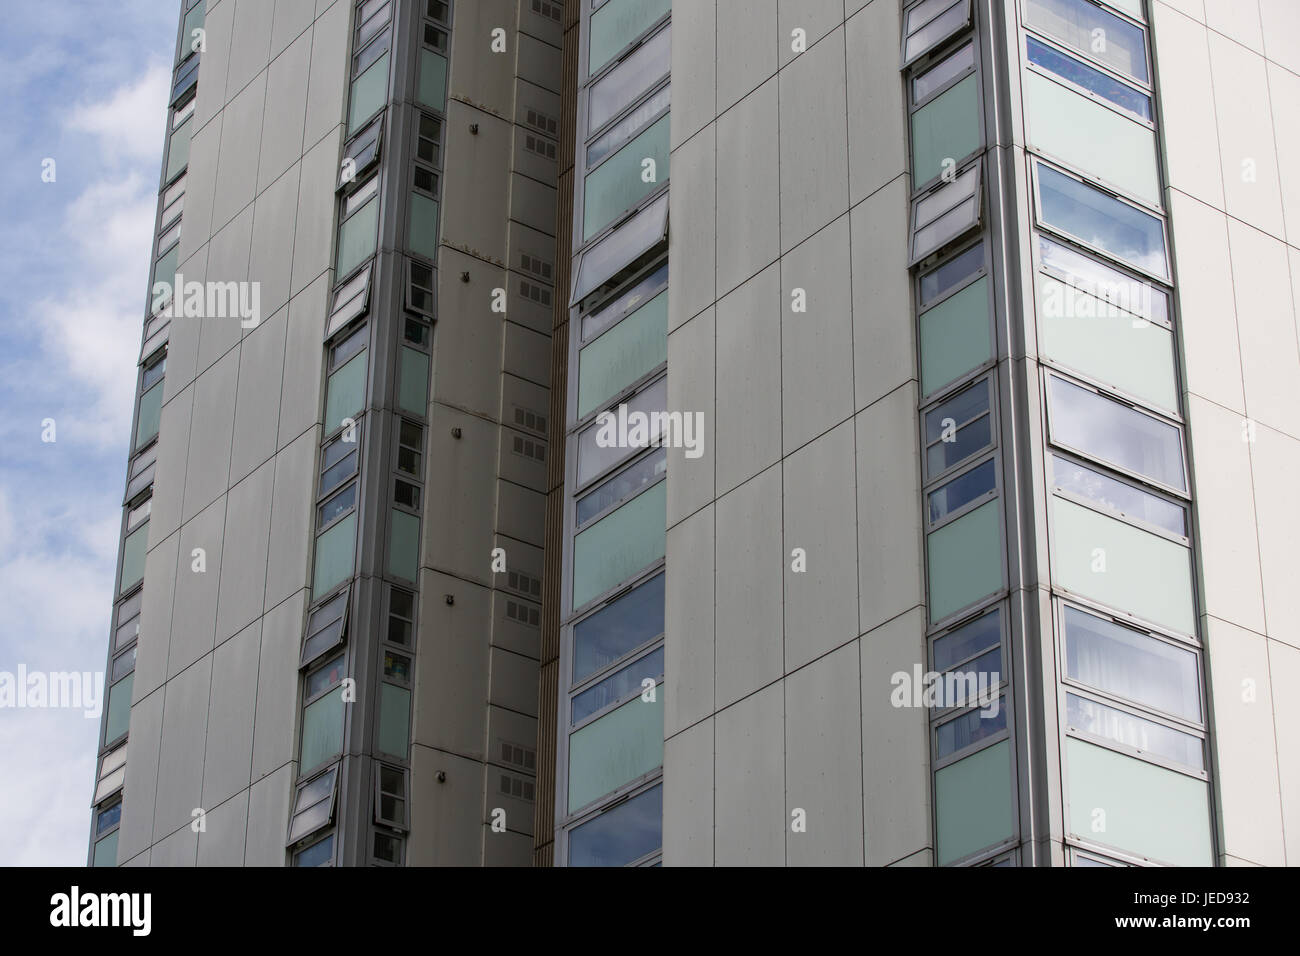 London, UK. 23rd June, 2017. Cladding panels on Blashford Tower in the Chalcots Estate in Camden. 600 households - Stock Image